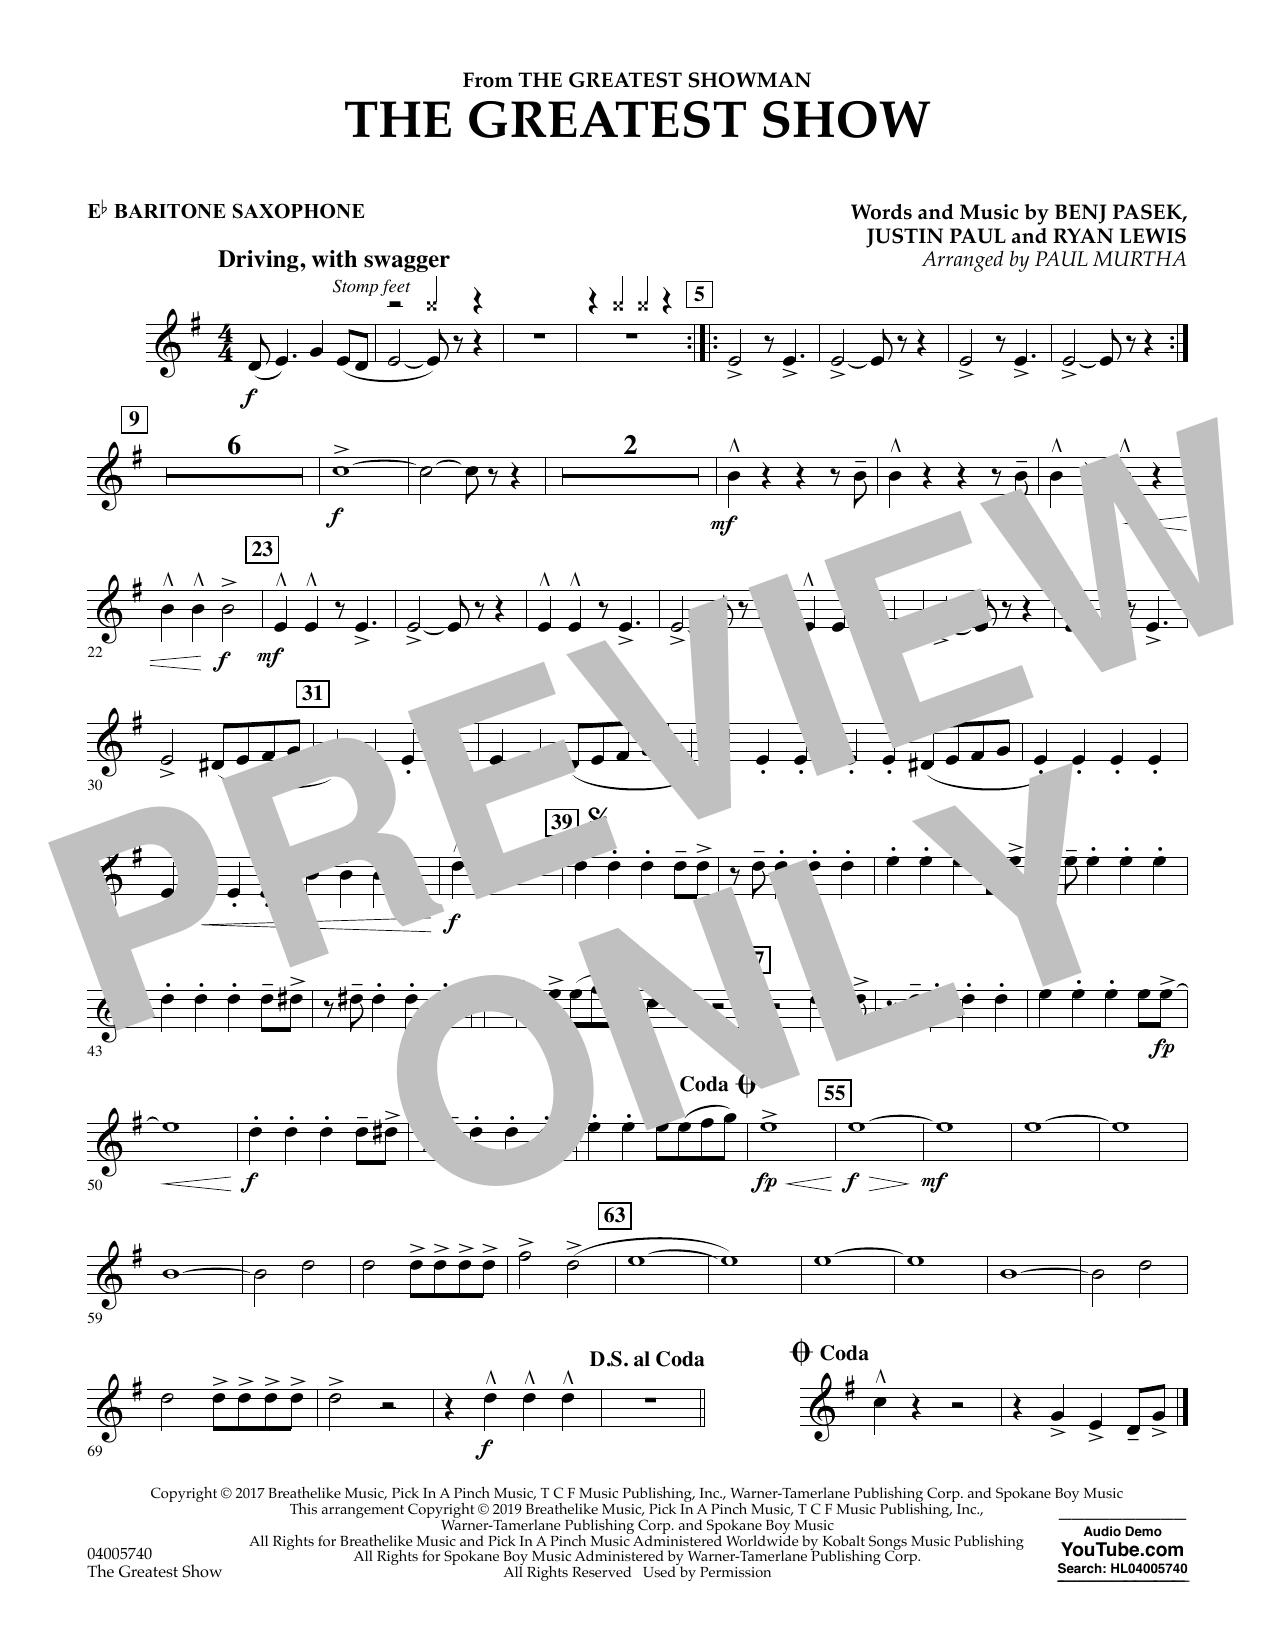 The Greatest Show  (arr. Paul Murtha) - Eb Baritone Saxophone (Concert Band)